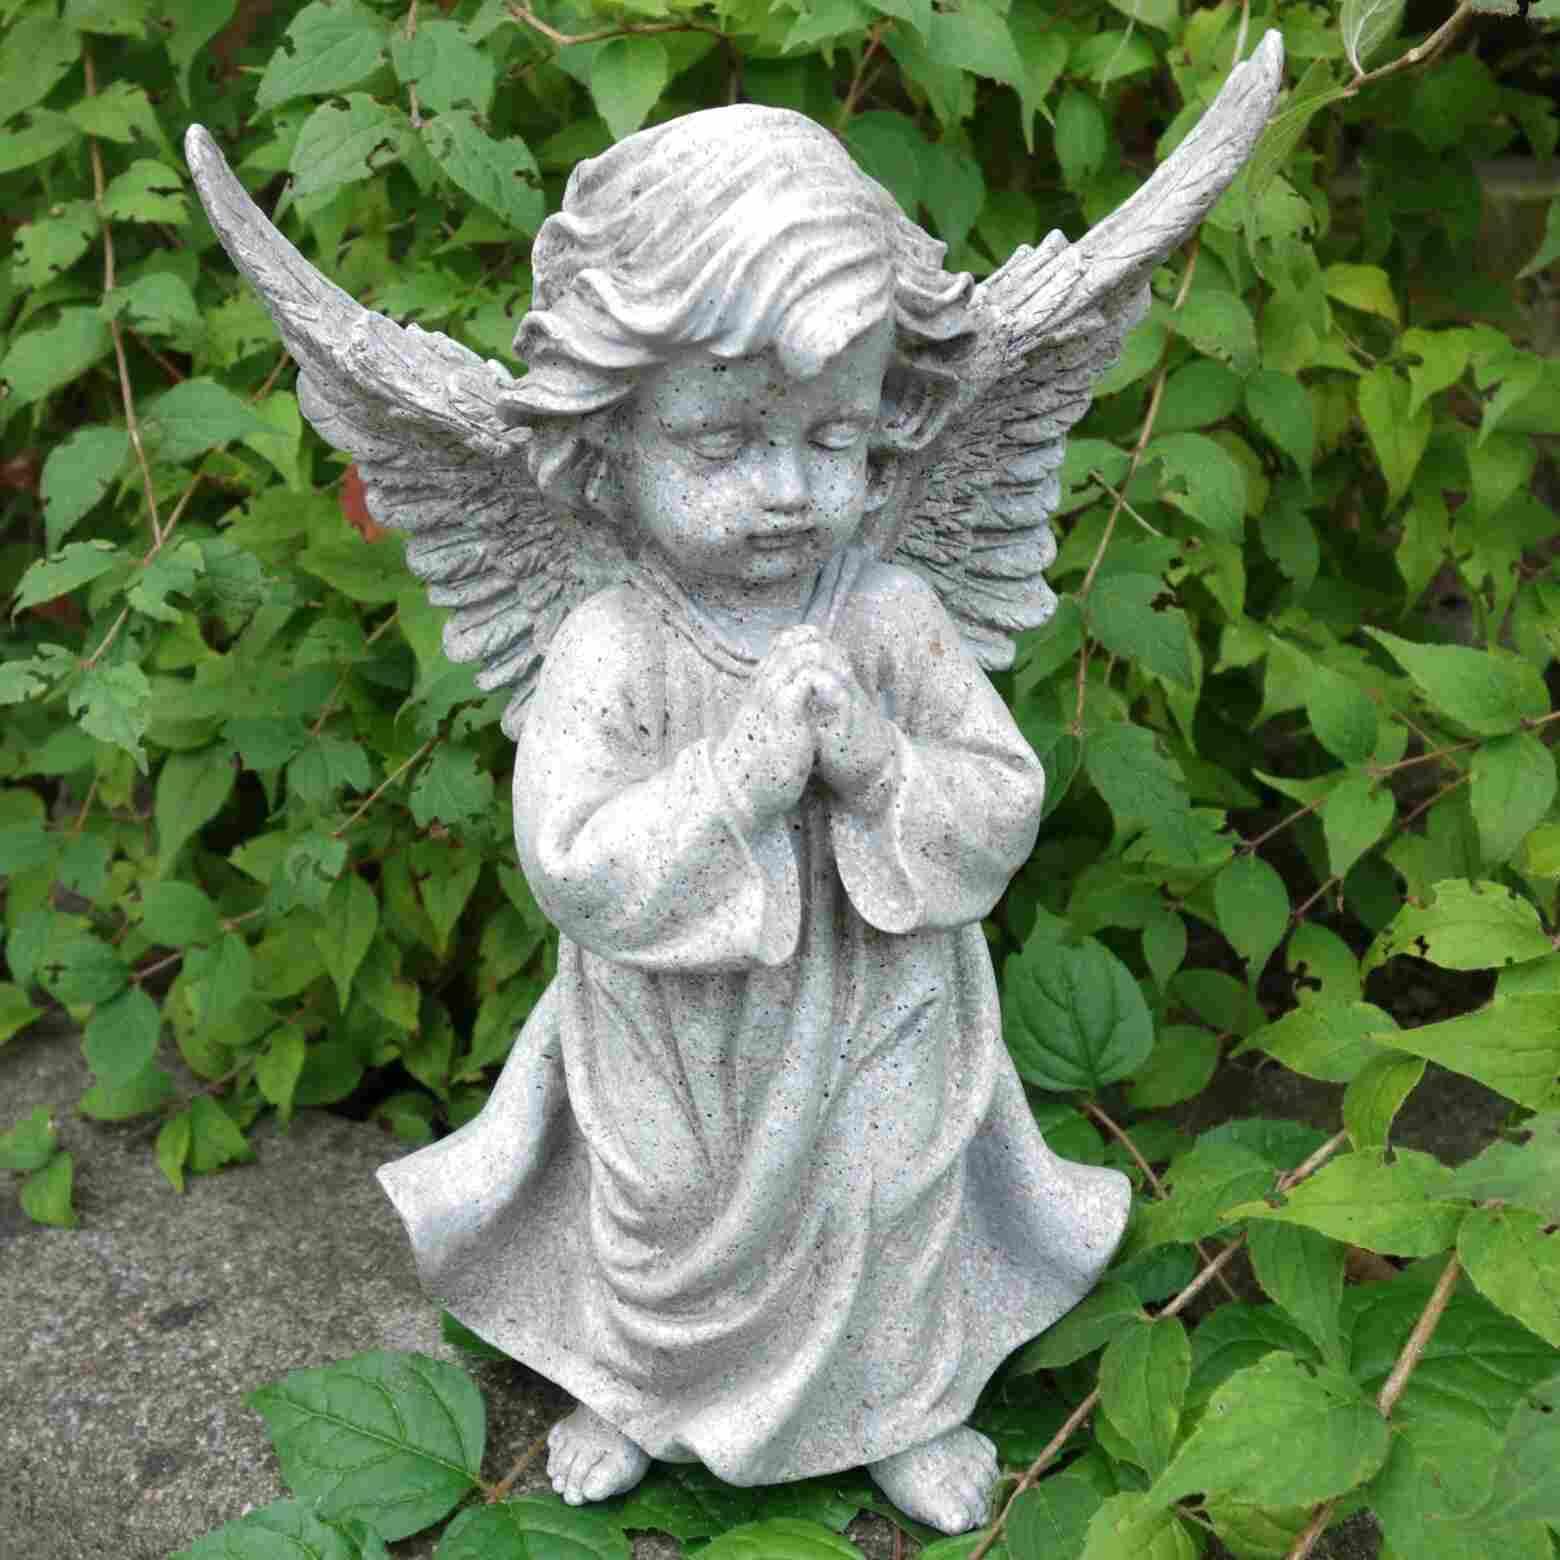 Grabschmuck Grabengel Keramik 18cm groß Engel kniend betend Trauerengel Grabdeko